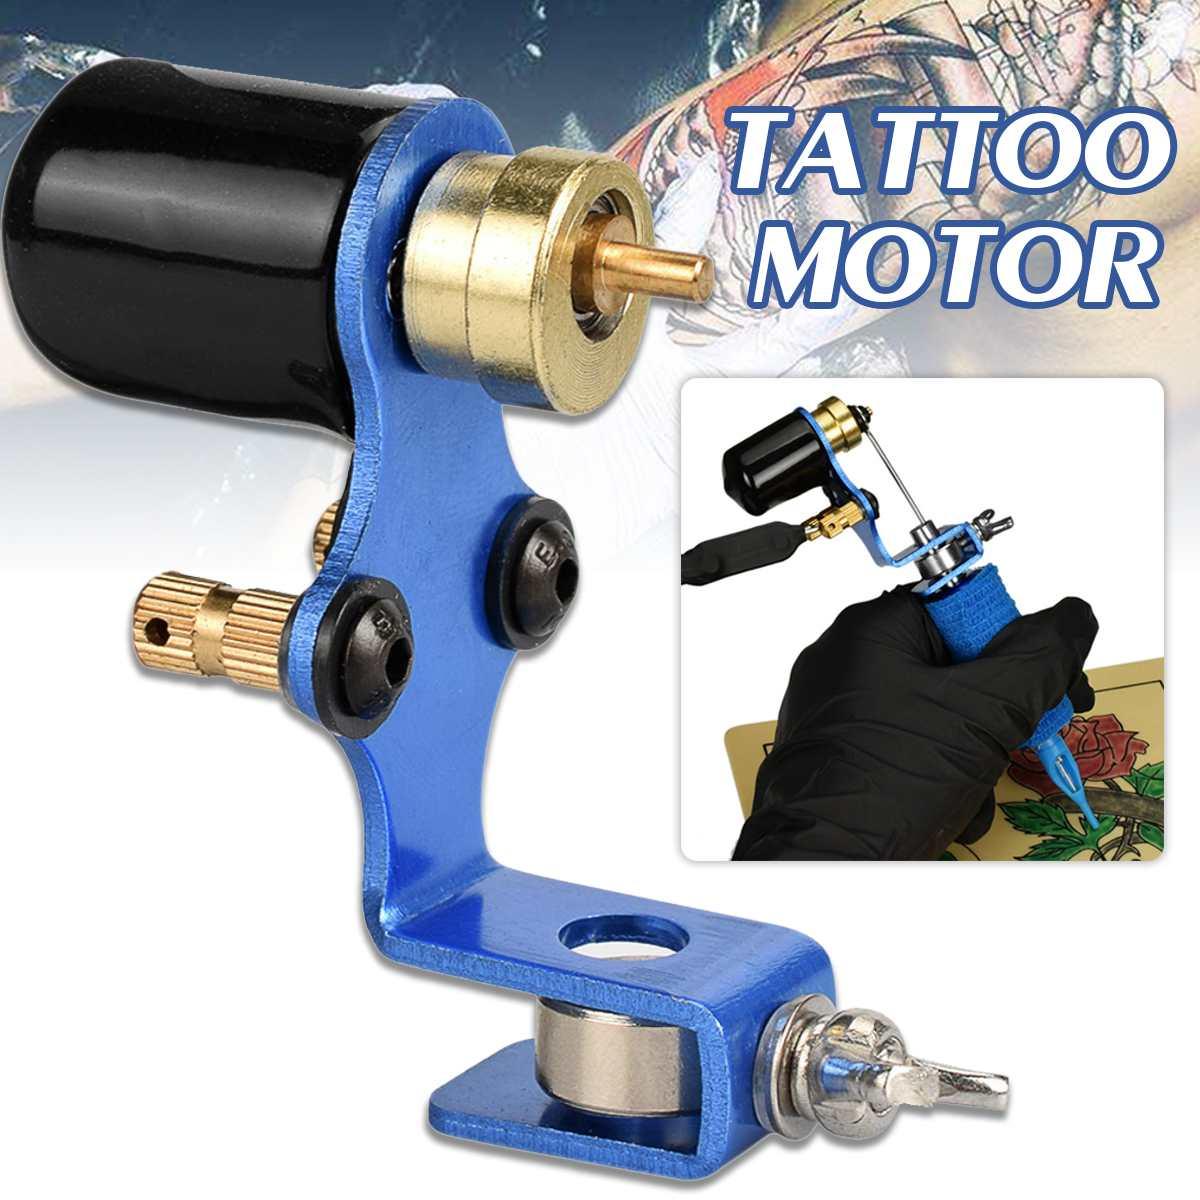 Professional Dragonfly Rotary Tattoo Machine Mini Tattoo Motor + Color Wheel Shaders Assorted Tatoo Guns Supplies For Beginner